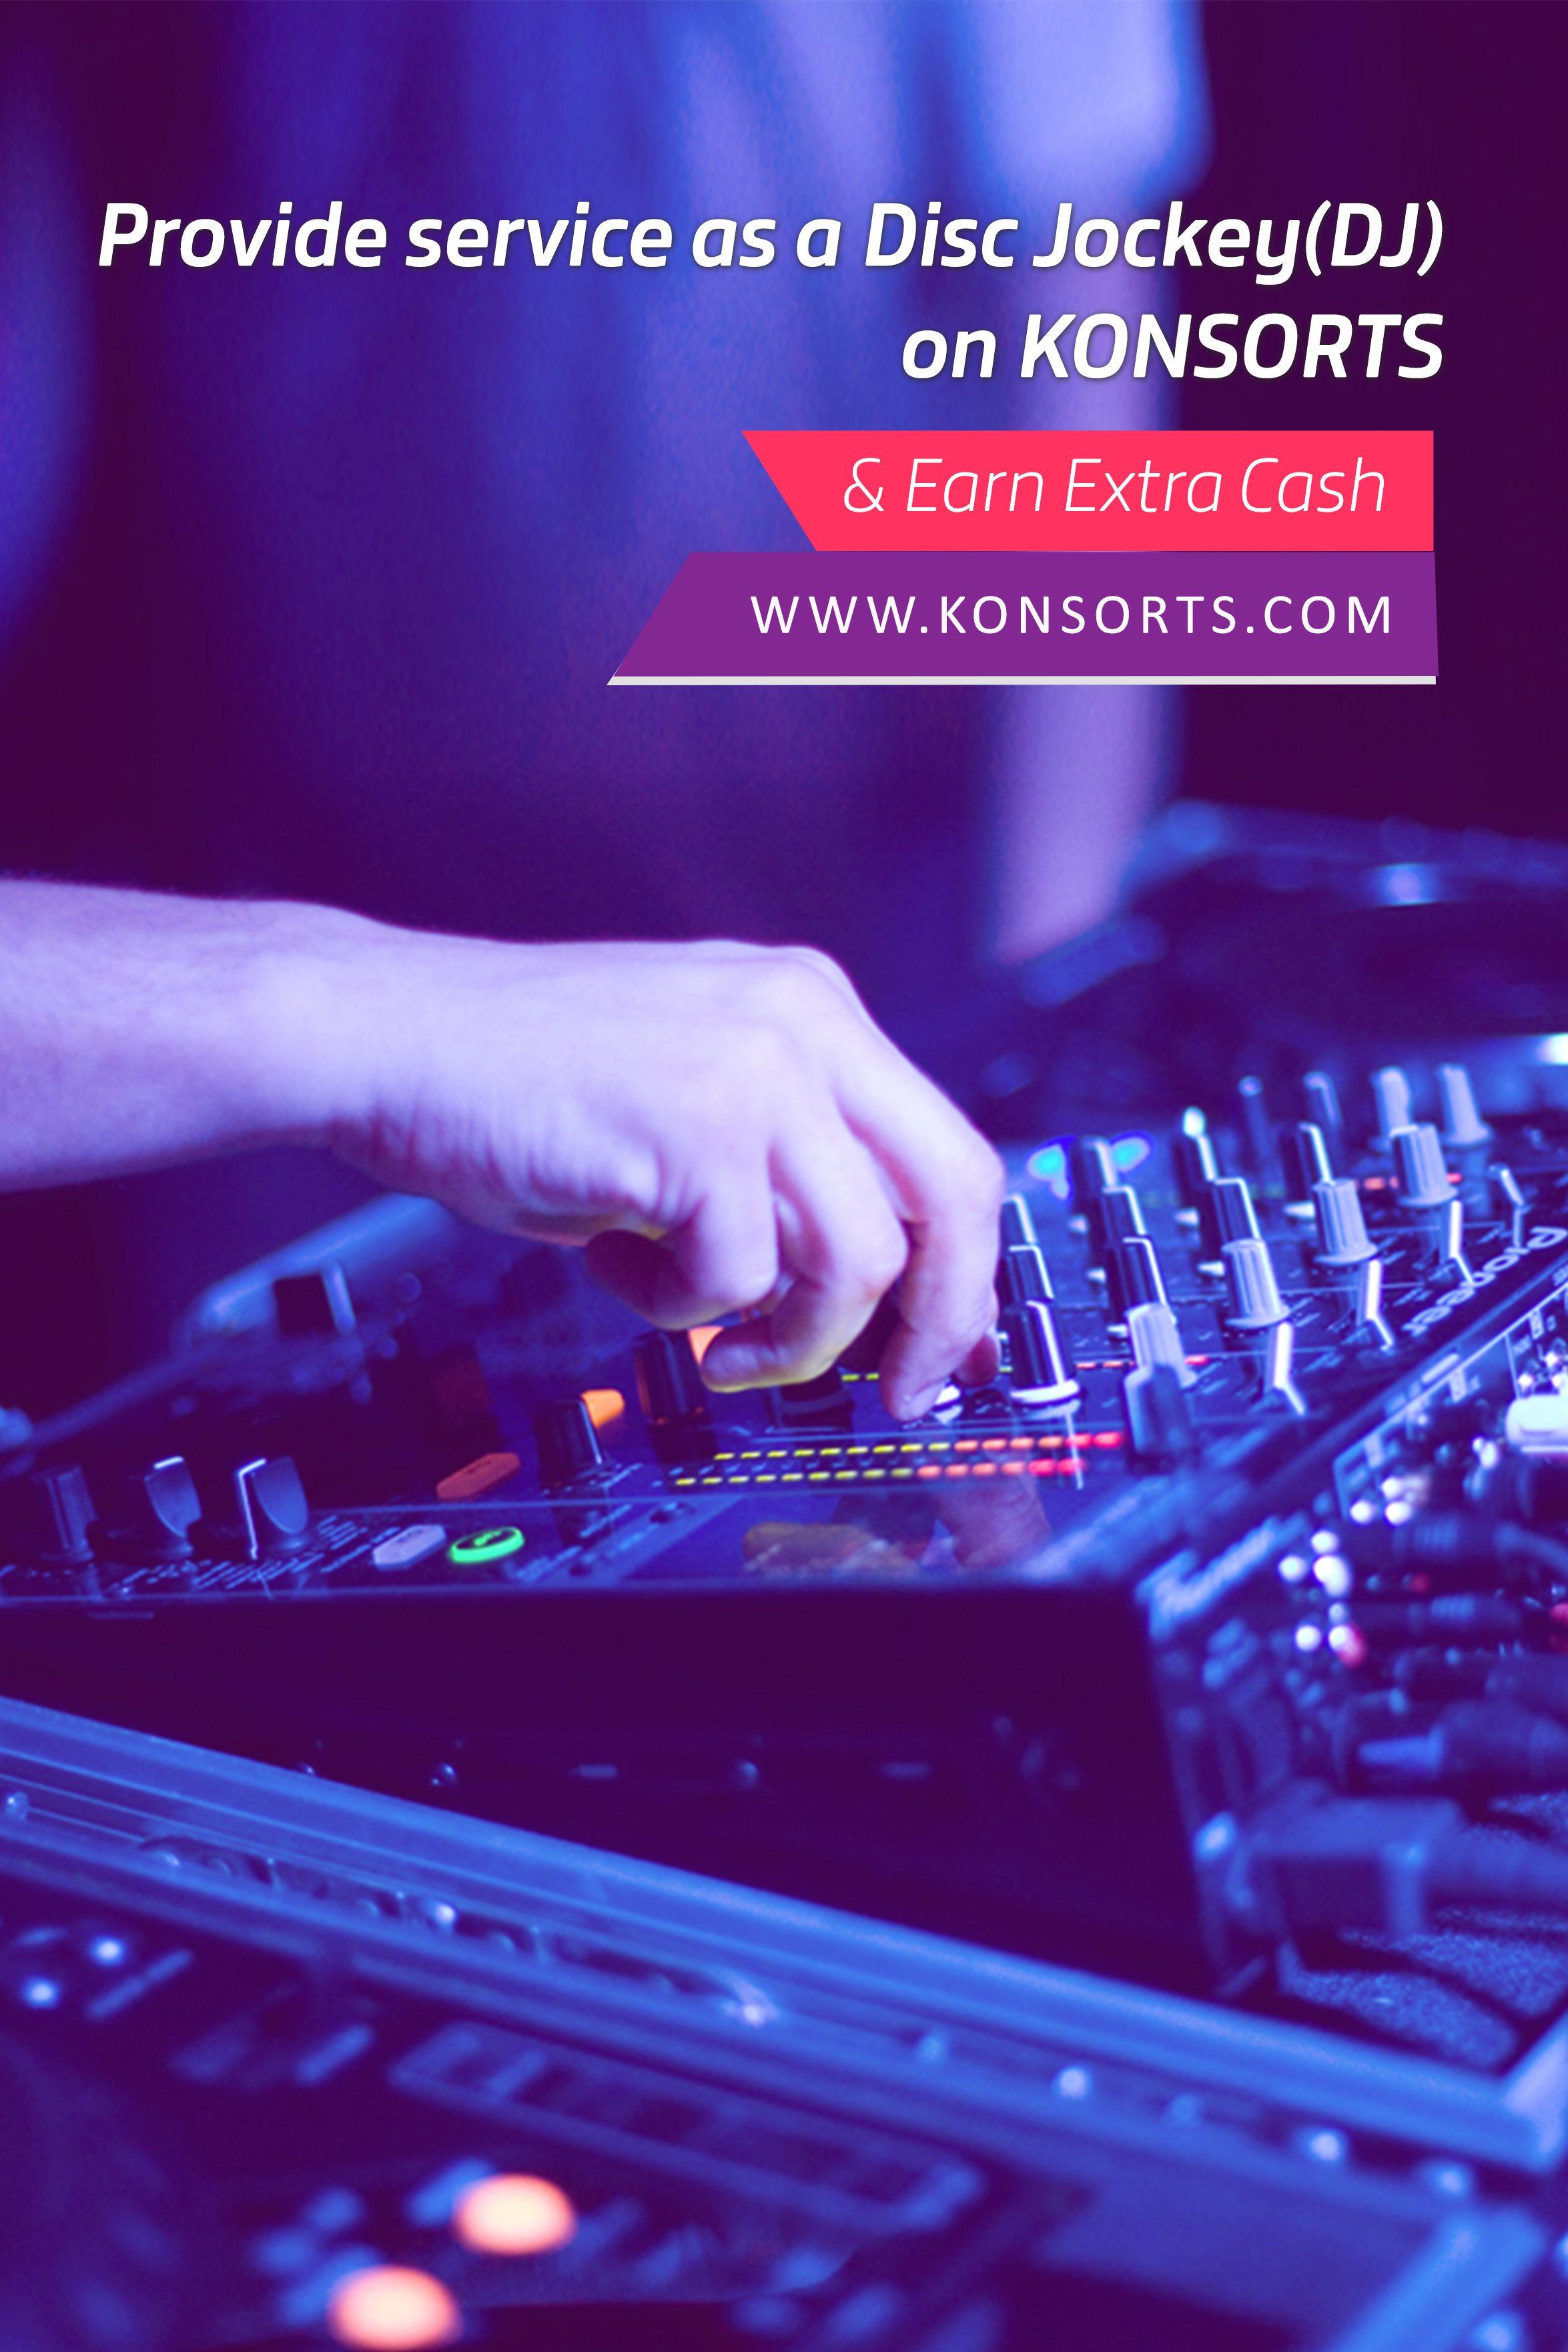 Disc Jockey (DJ) International Service Provider Community